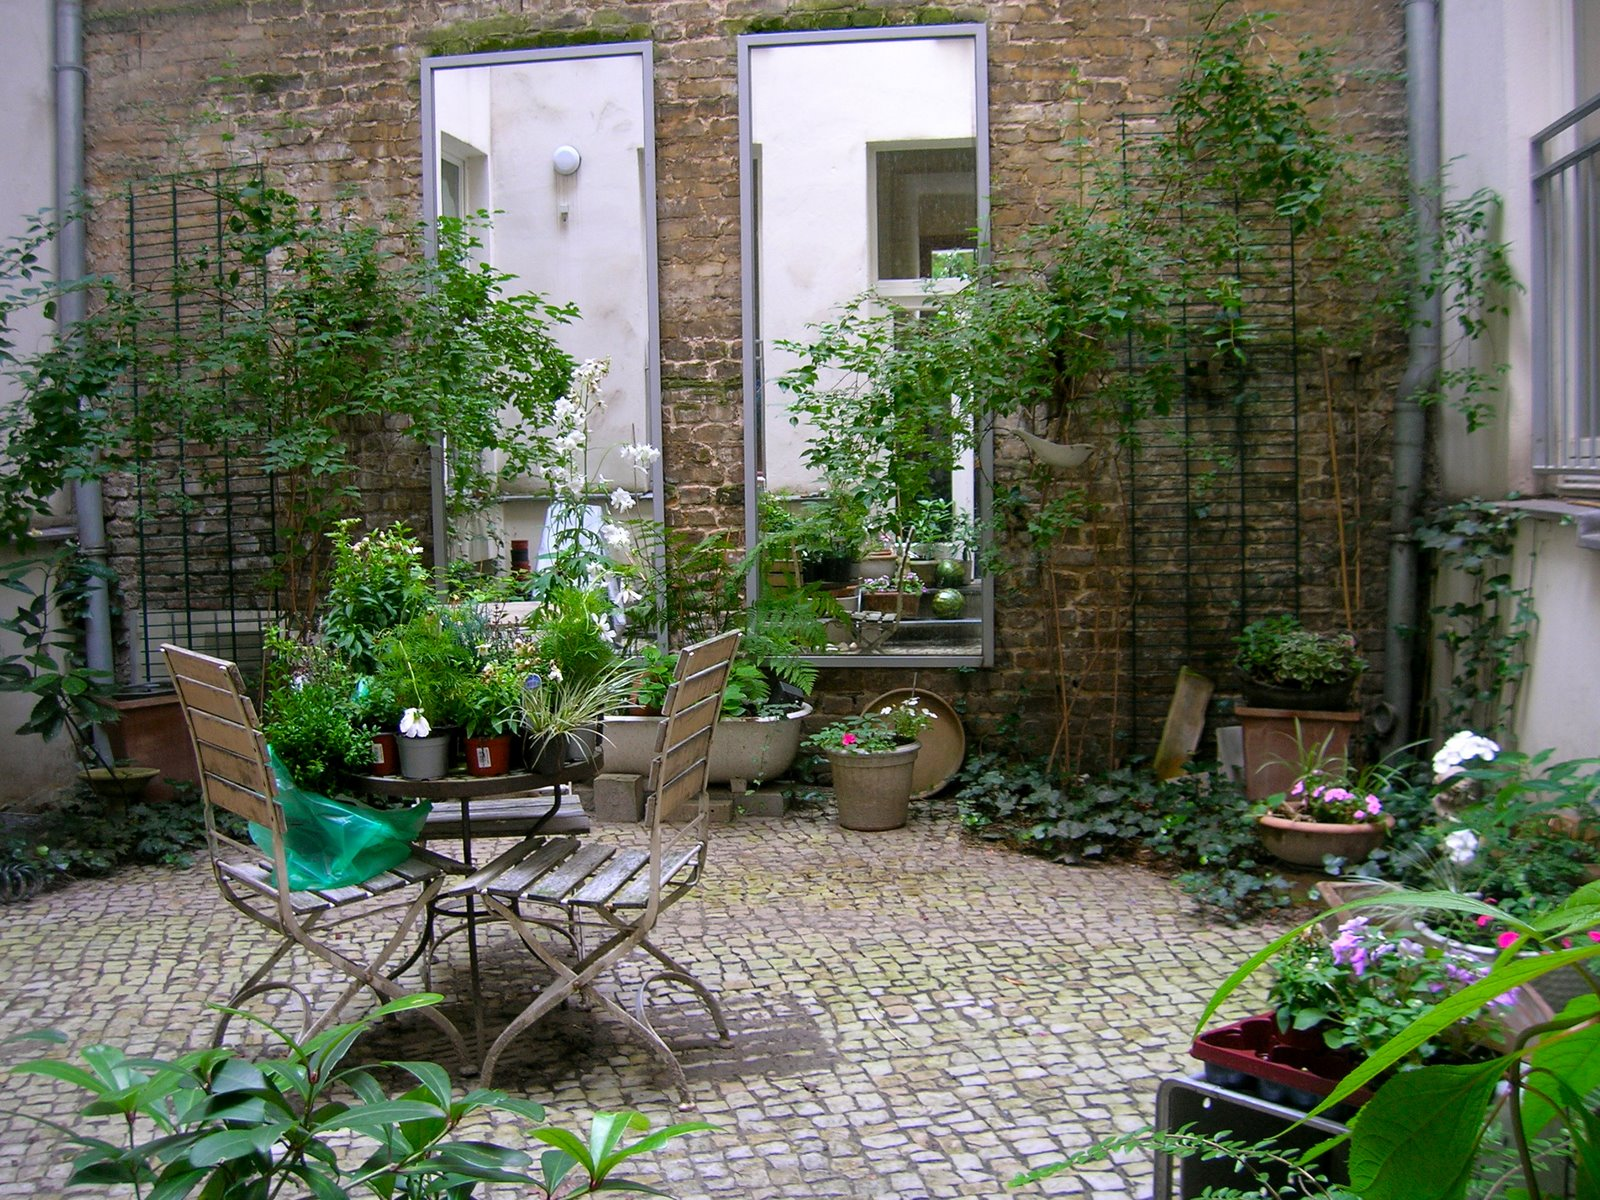 berliner hinterh fe gipsstra e 4 berlin mitte. Black Bedroom Furniture Sets. Home Design Ideas